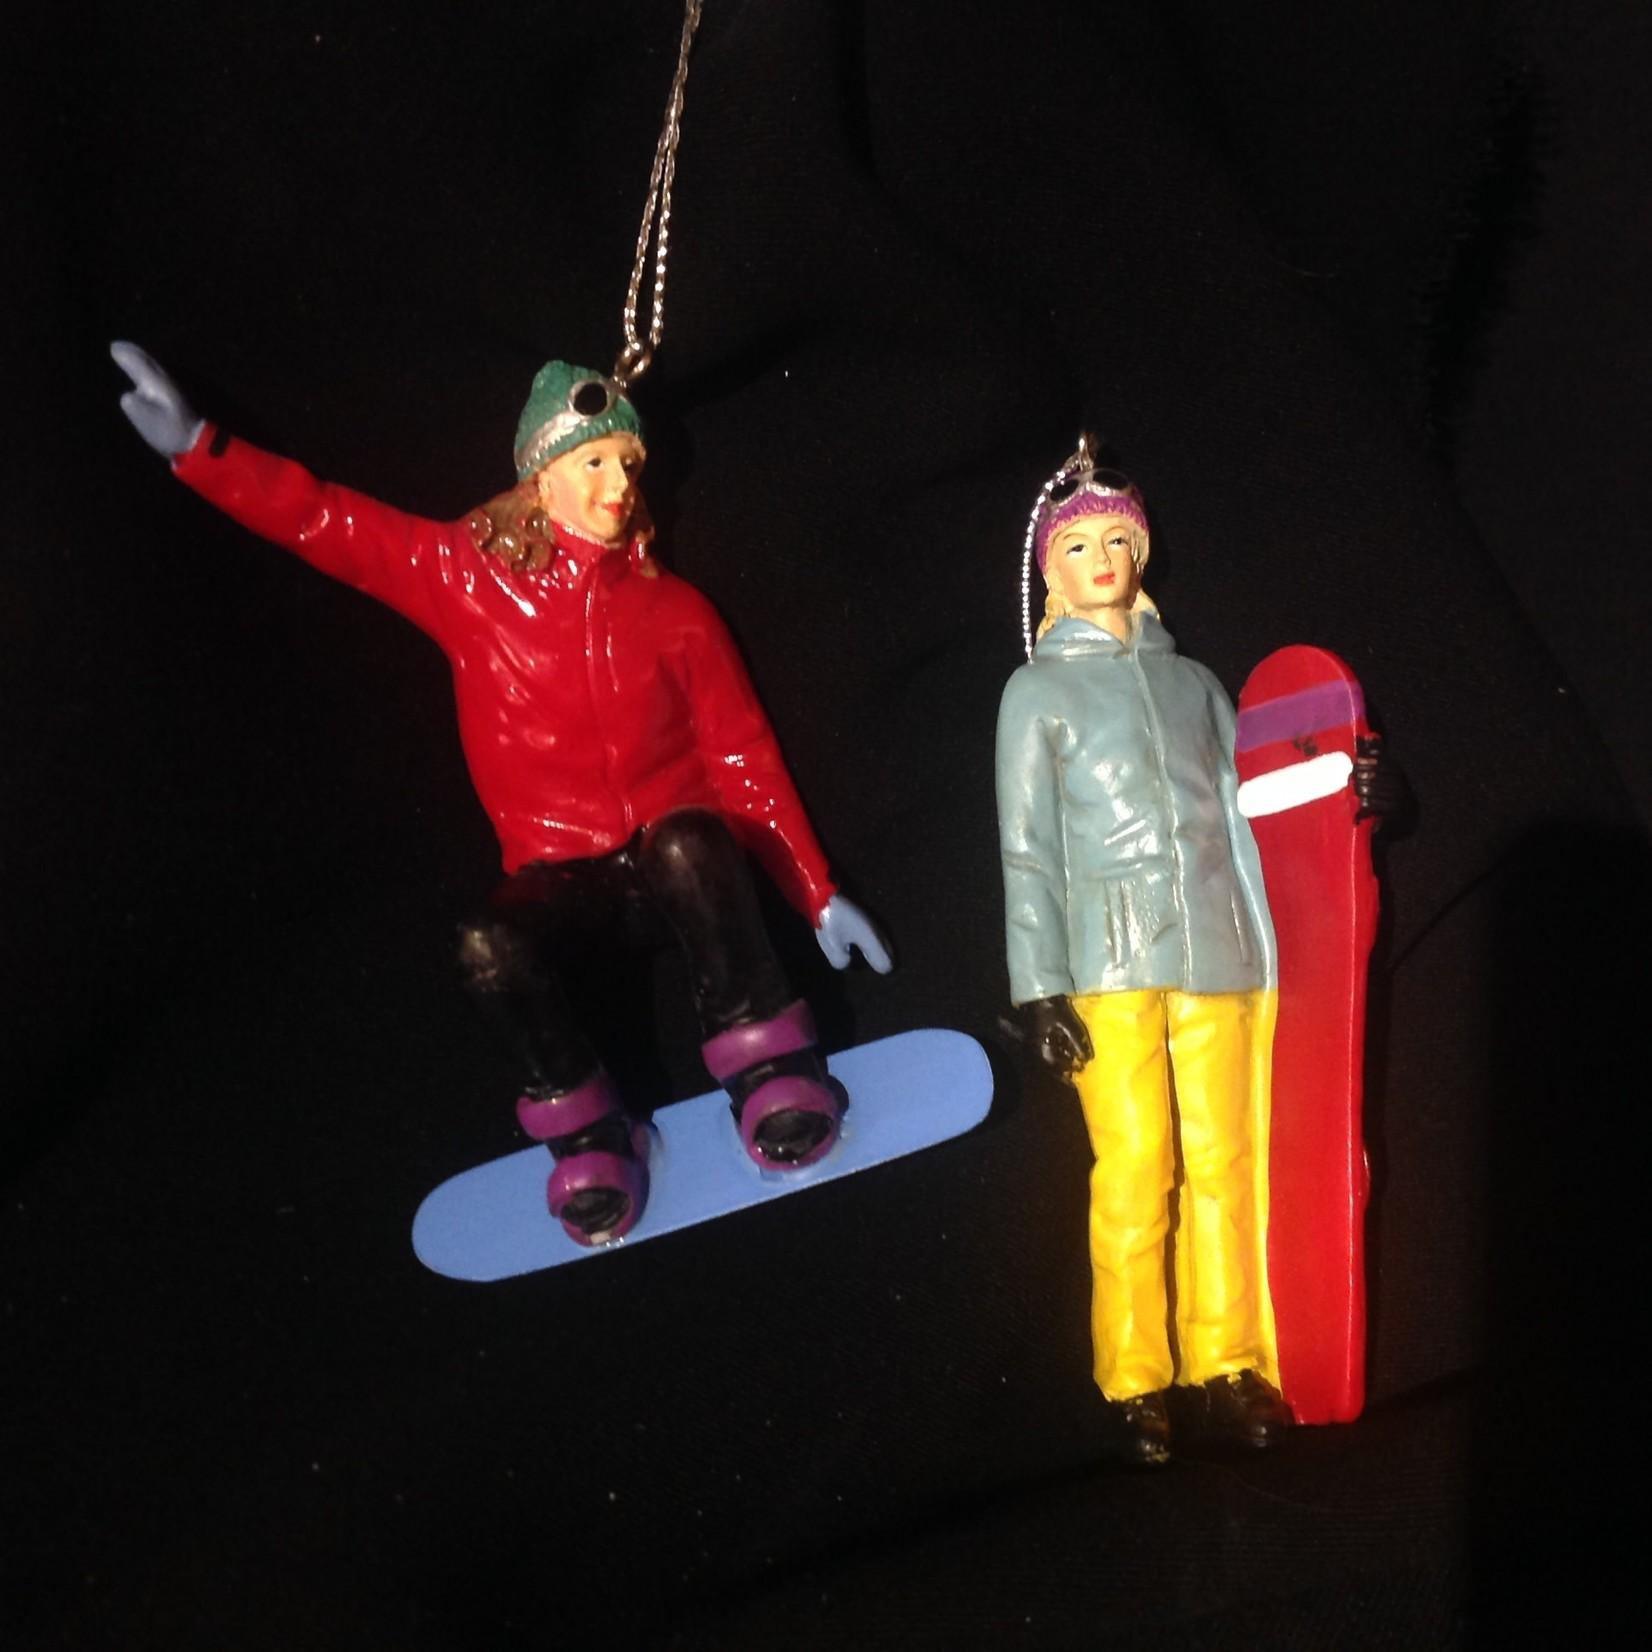 Woman Snowboarder Orn 2A